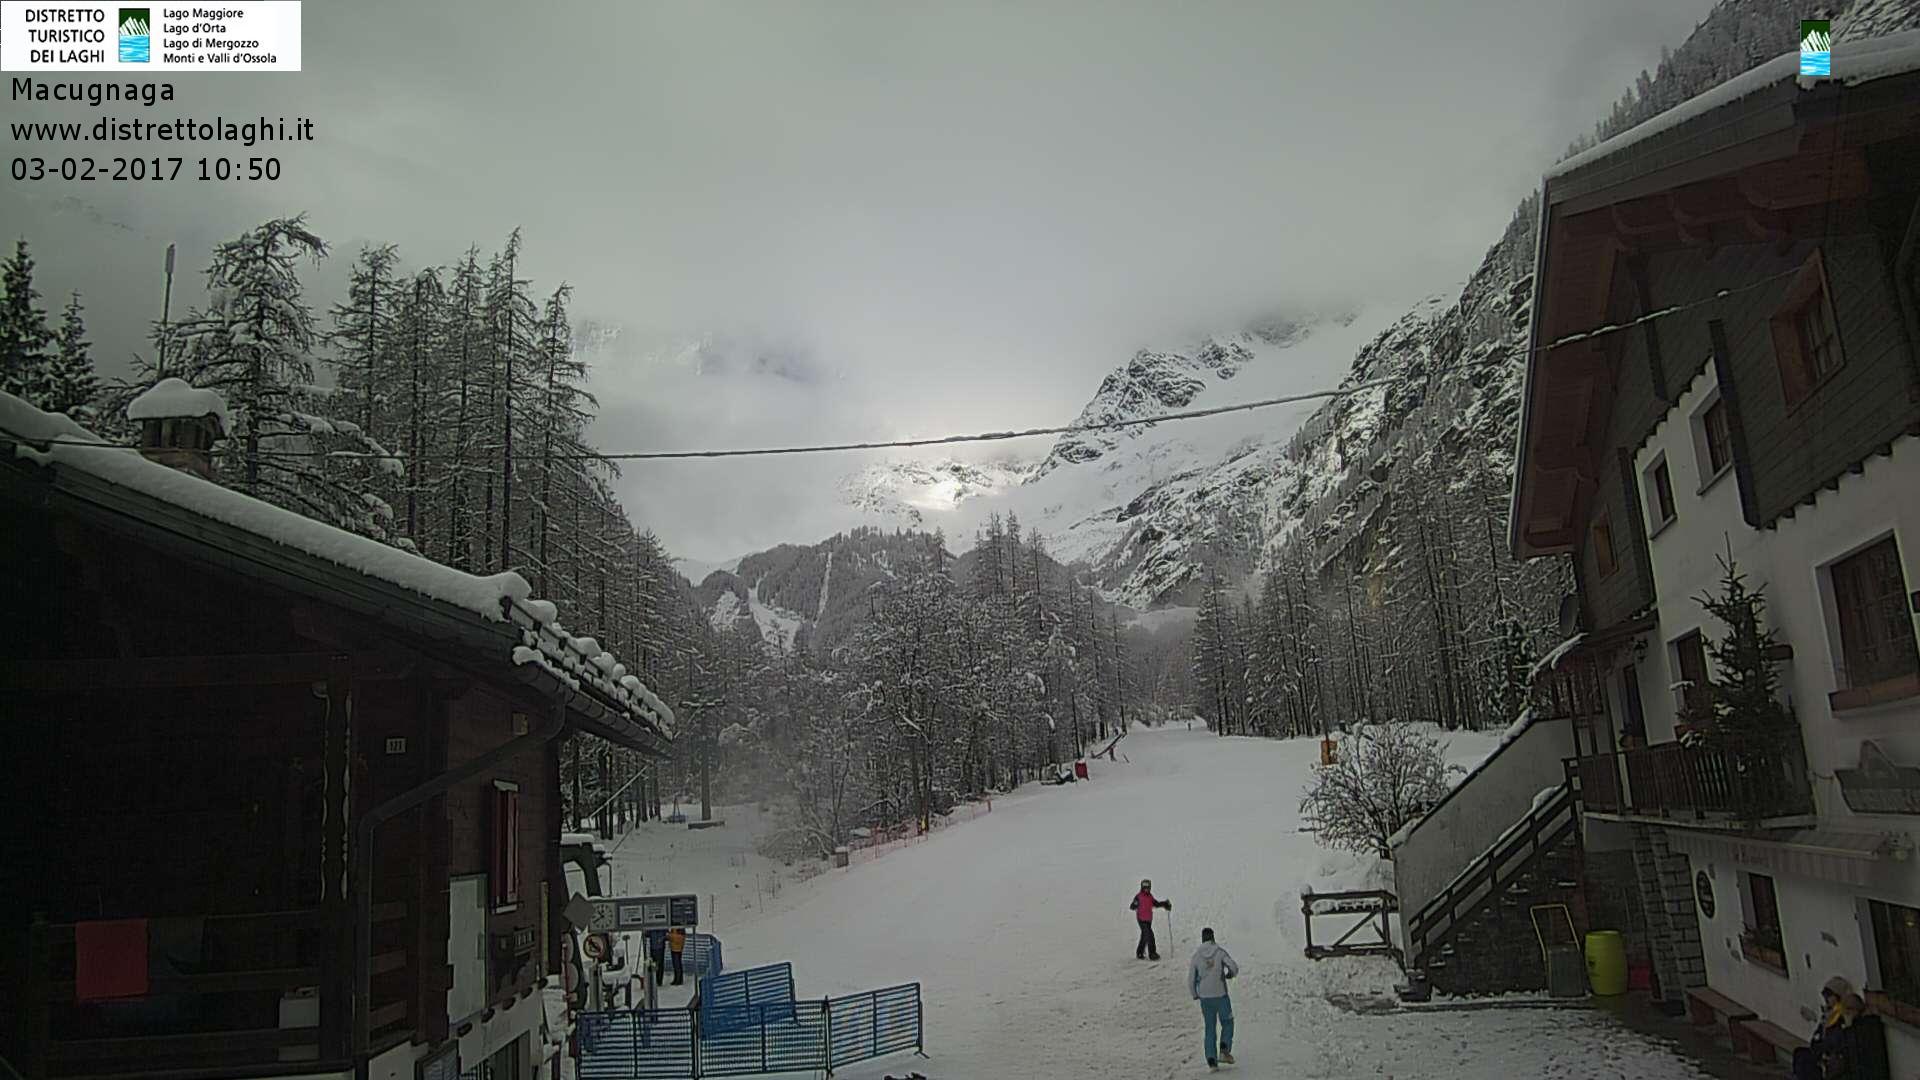 Nevicata intensa sulle Alpi